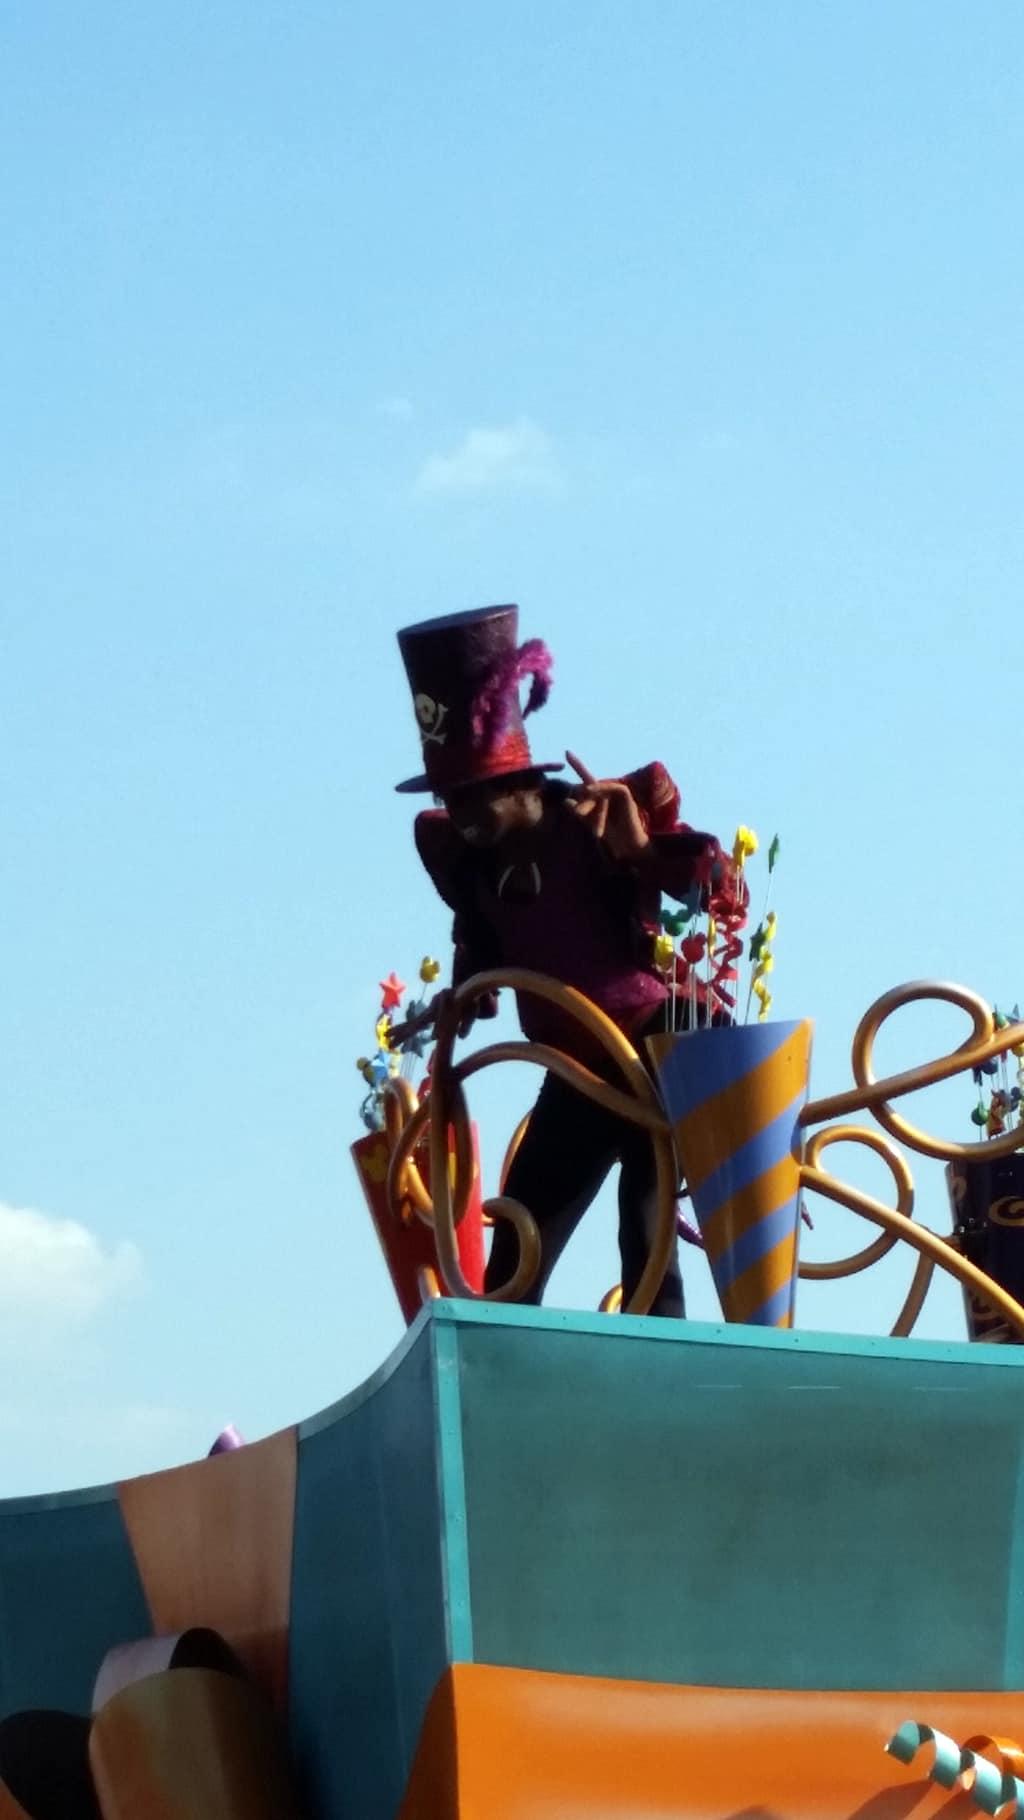 Move it Shake it Celebrate it with Dr. Facilier in Magic Kingdom in Walt Disney World